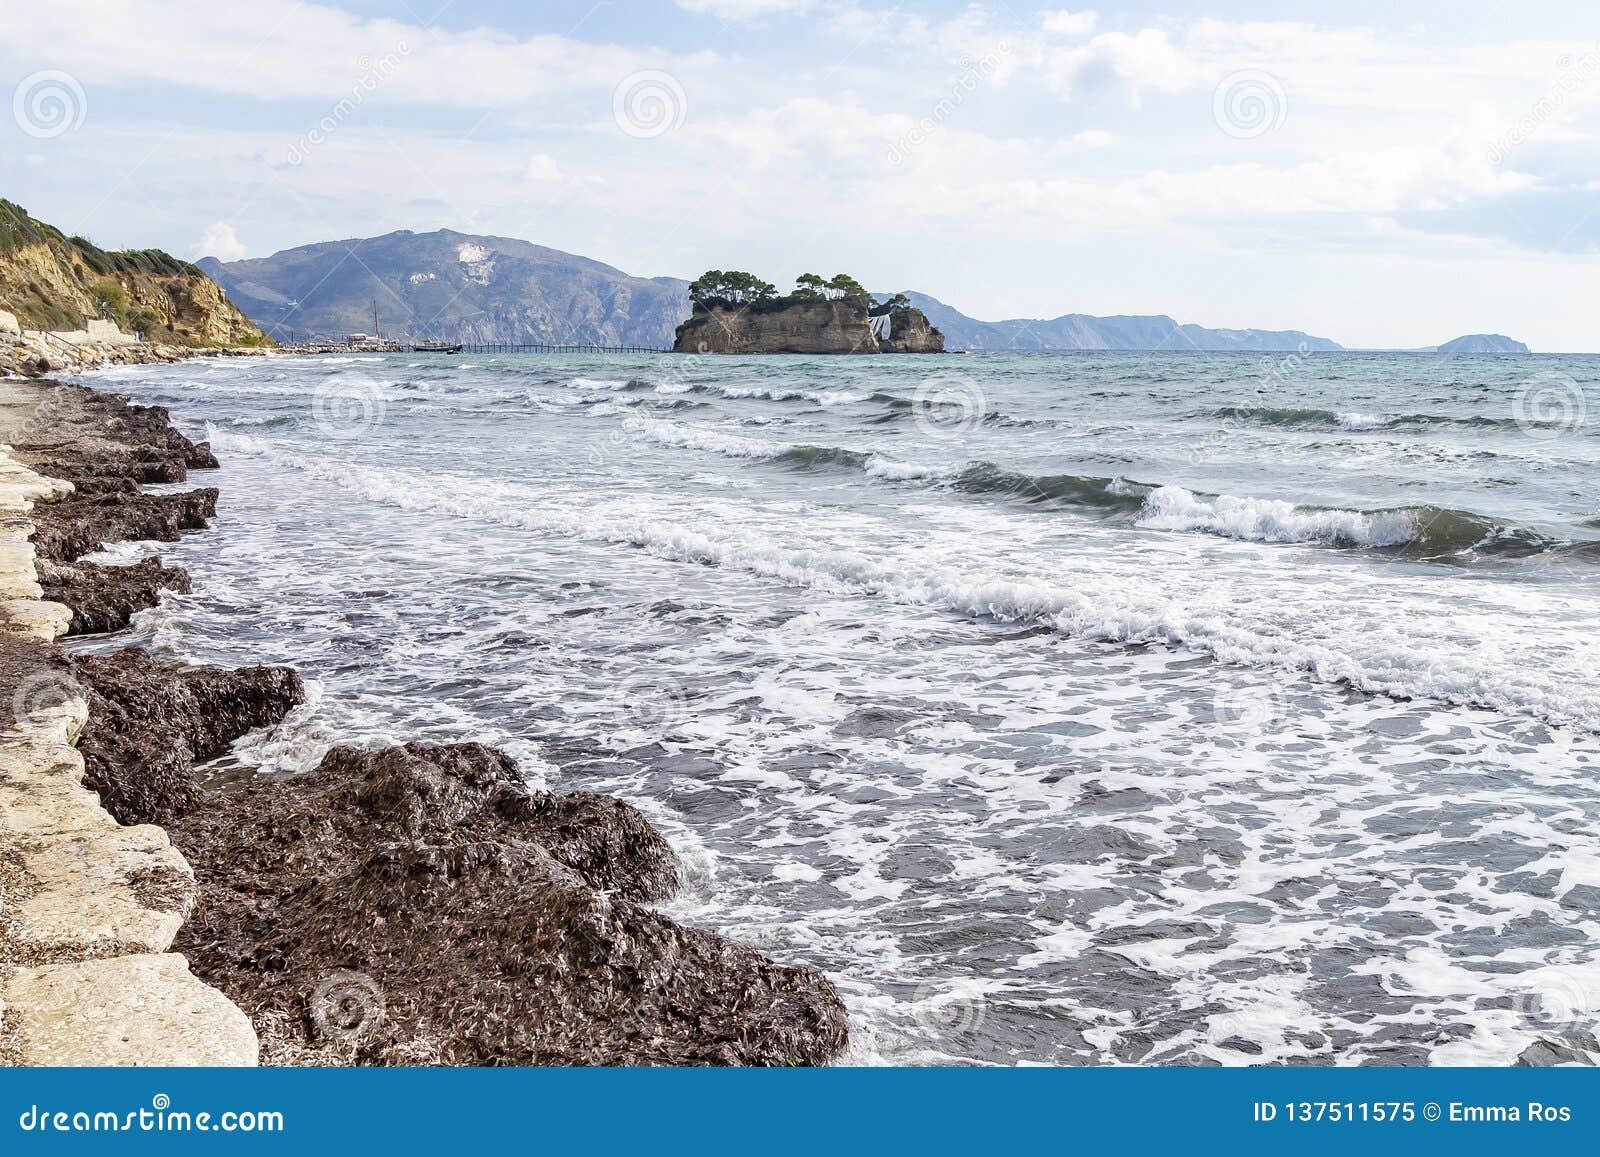 The wedding island Agios Sostis seen from the coast near Laganas on Zakynthos, Greece